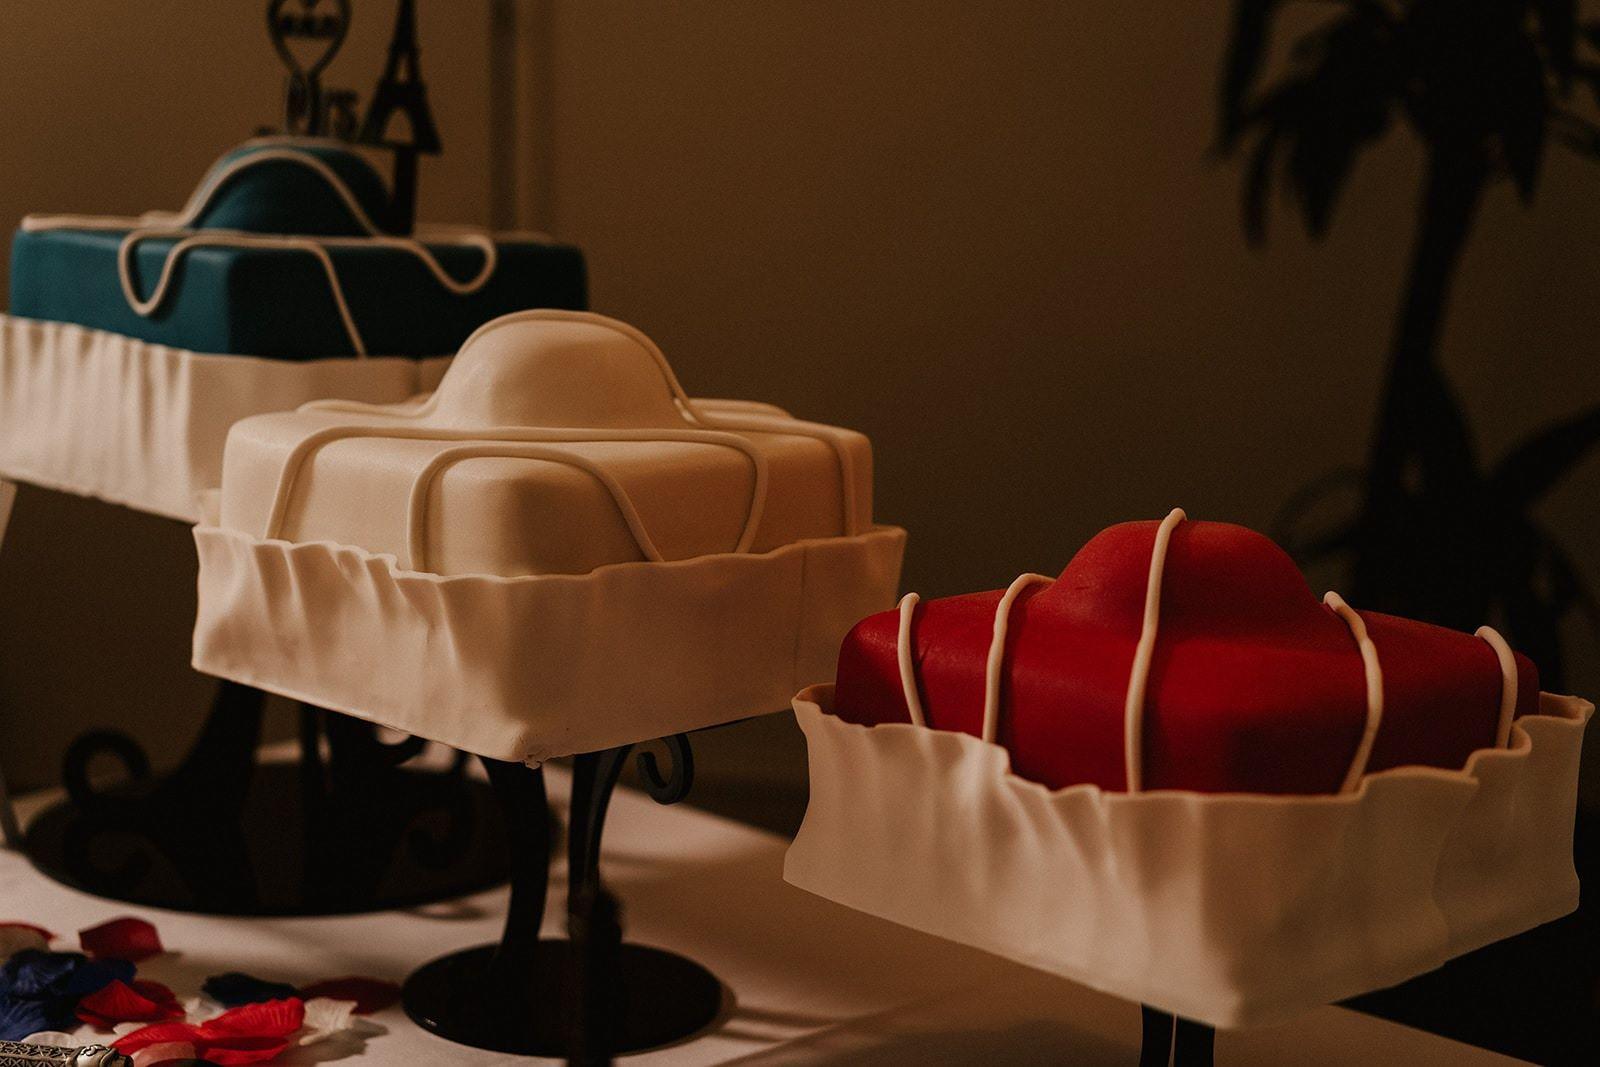 french fancie wedding cakes